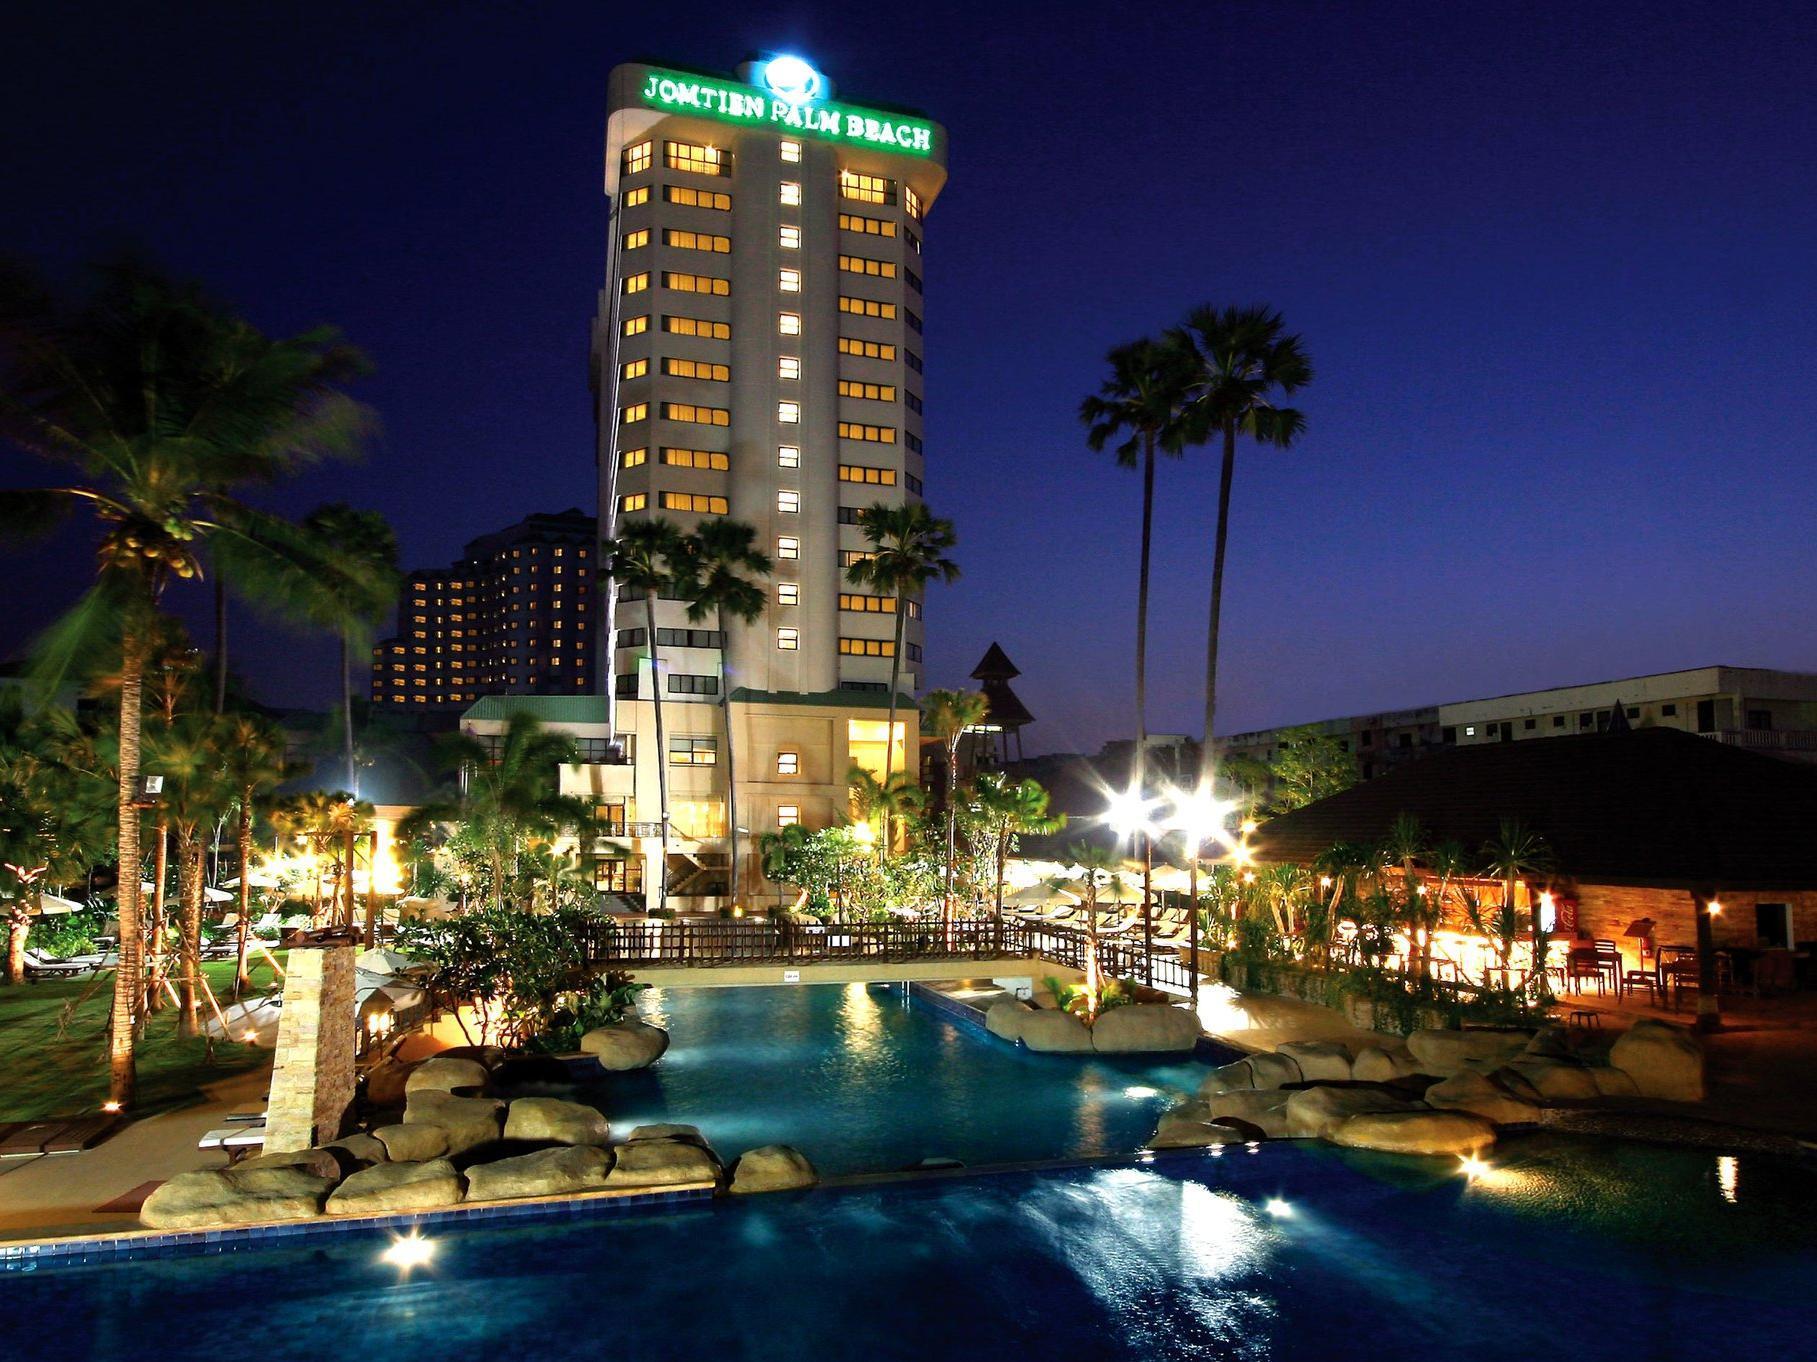 Jomtien Palm Beach Hotel And Resort Pattaya Thailand